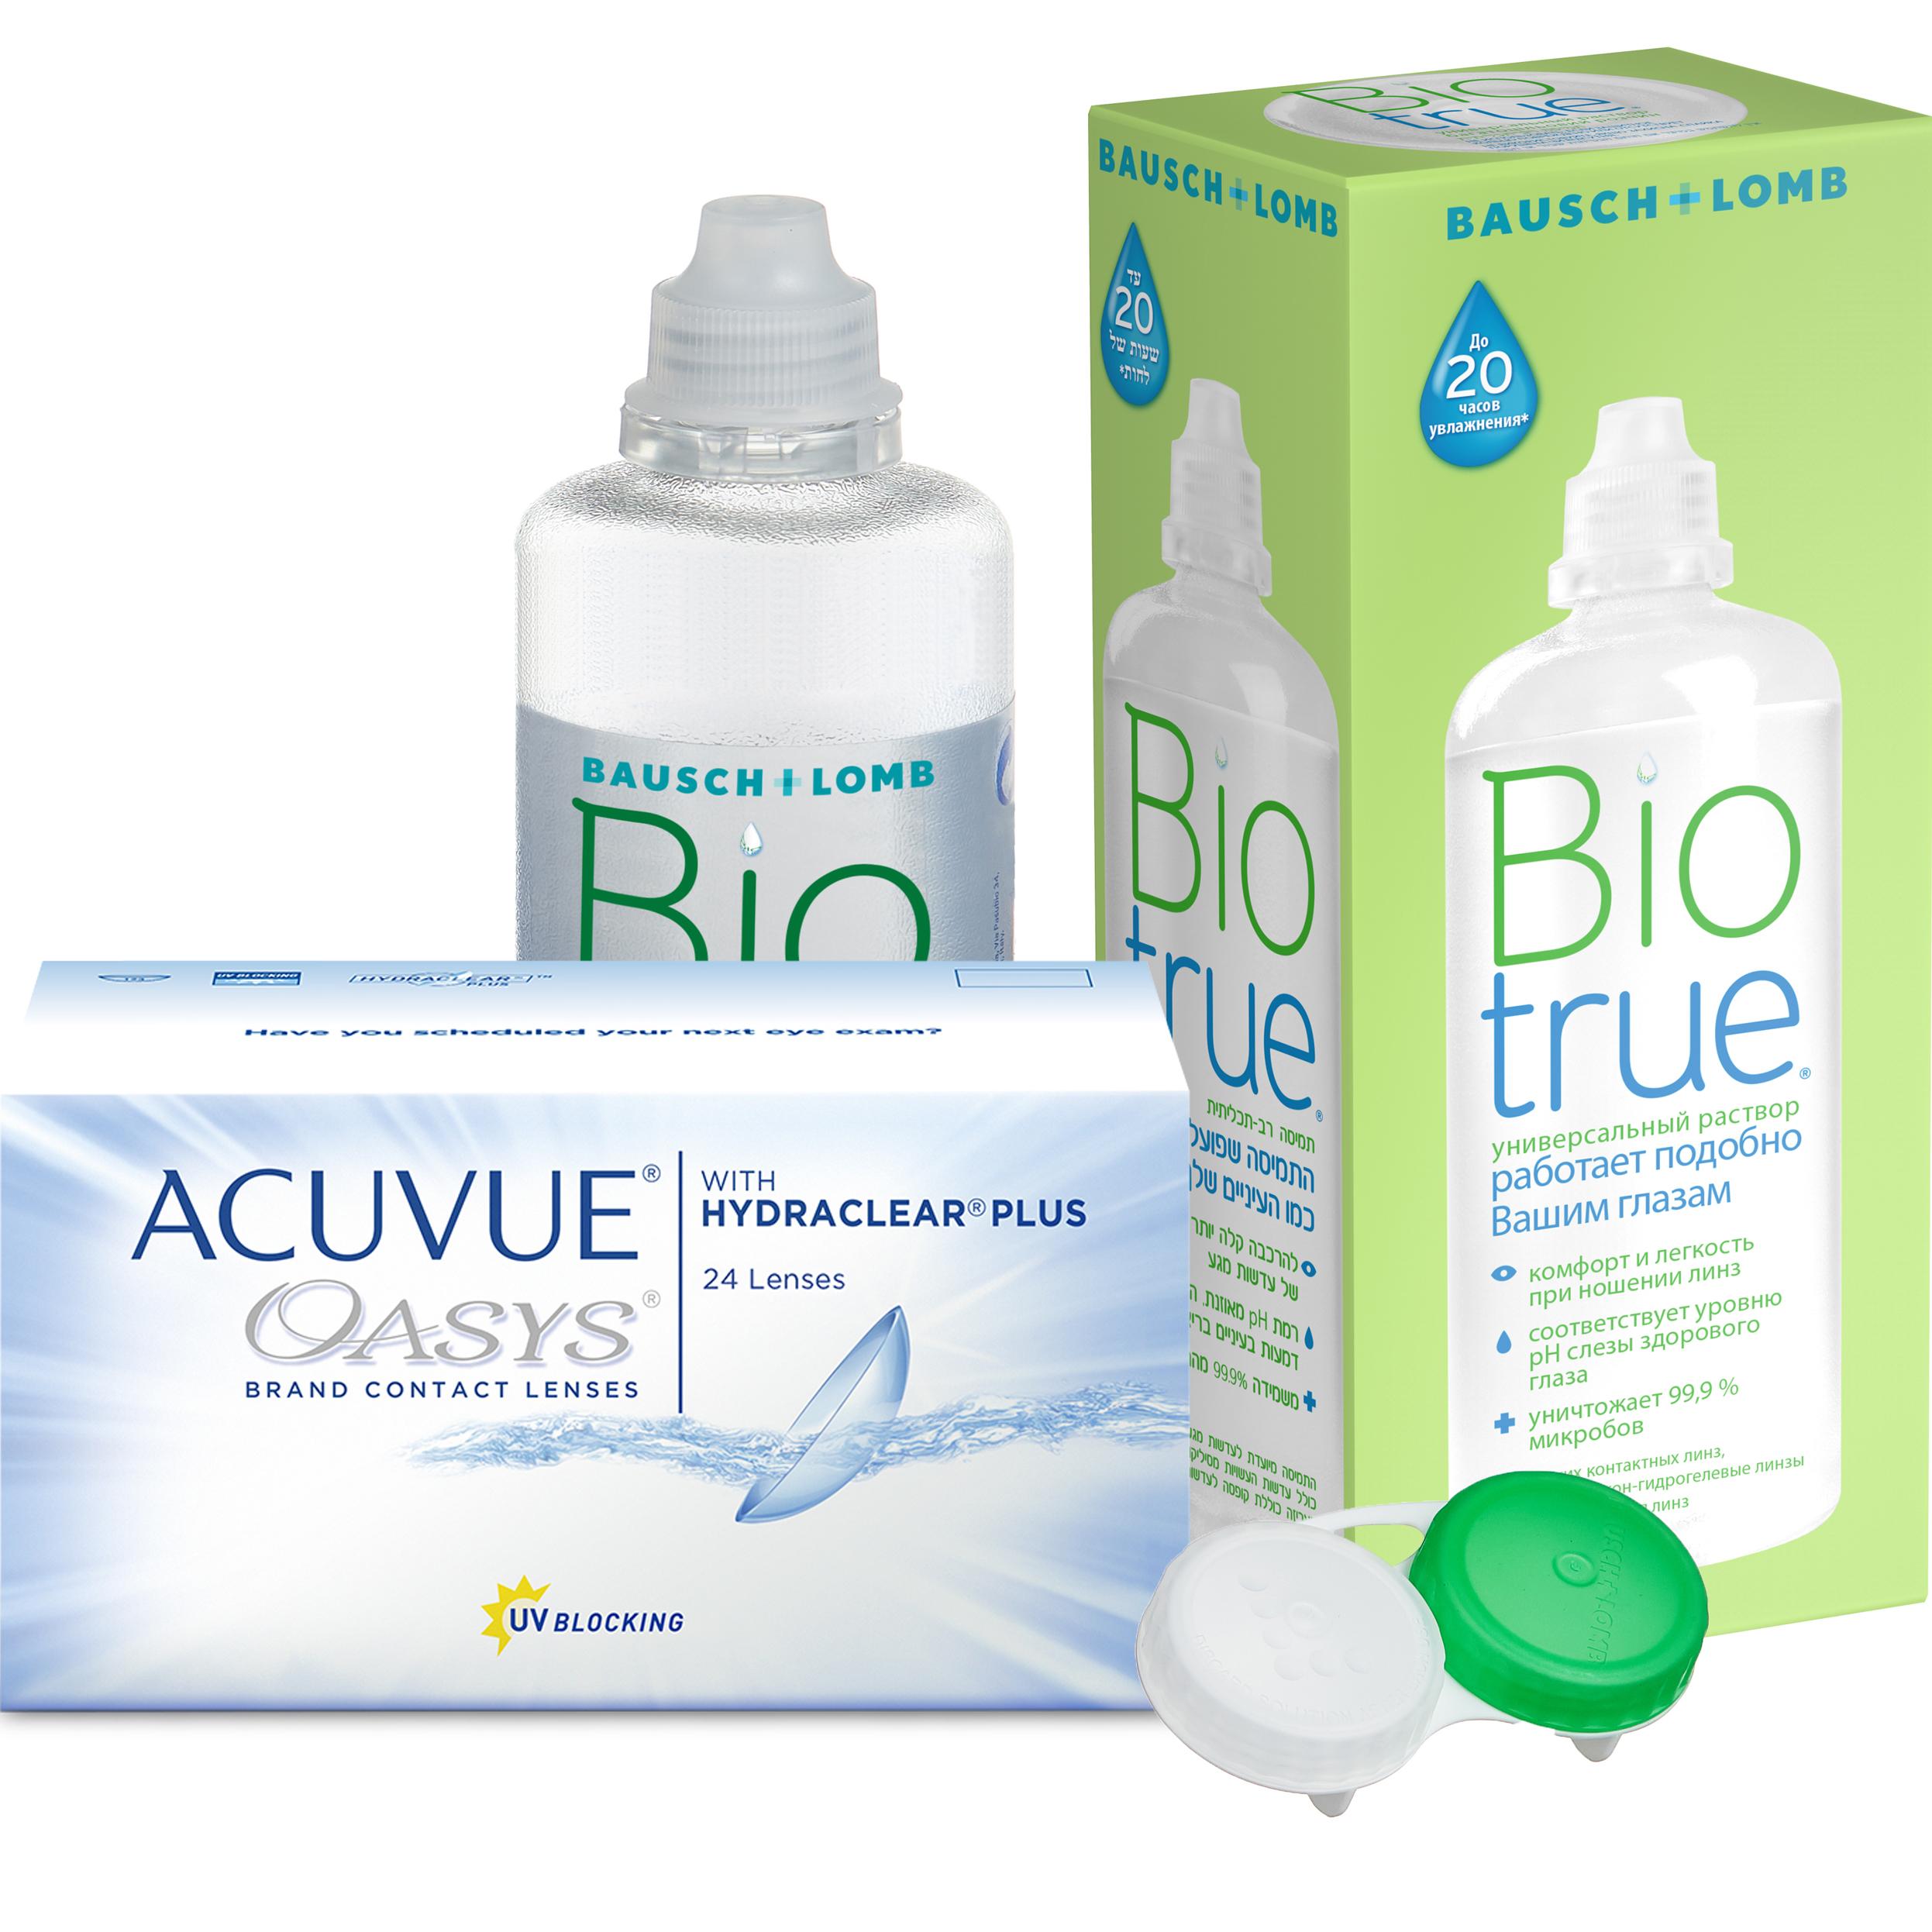 Купить Oasys with Hydraclear Plus 24 линзы + Biotrue, Контактные линзы Acuvue Oasys with Hydraclear Plus 24 линзы R 8.4 +0, 25 + Biotrue 300 мл